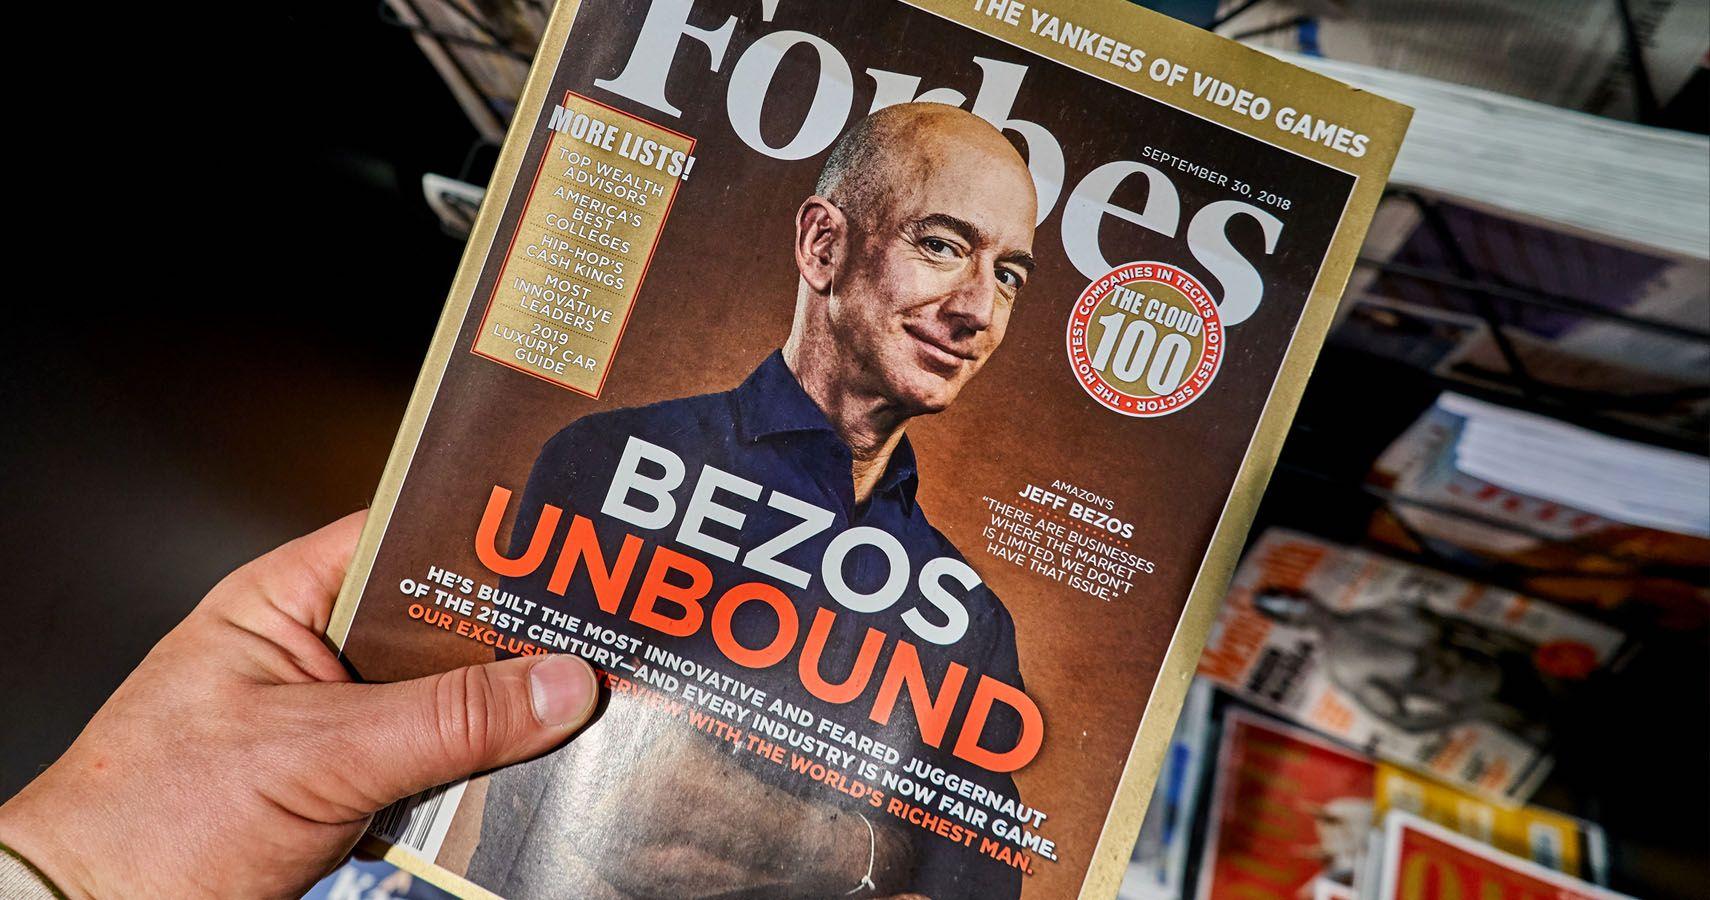 Before The Billions: The Life Of Jeff Bezos Prior To Amazon